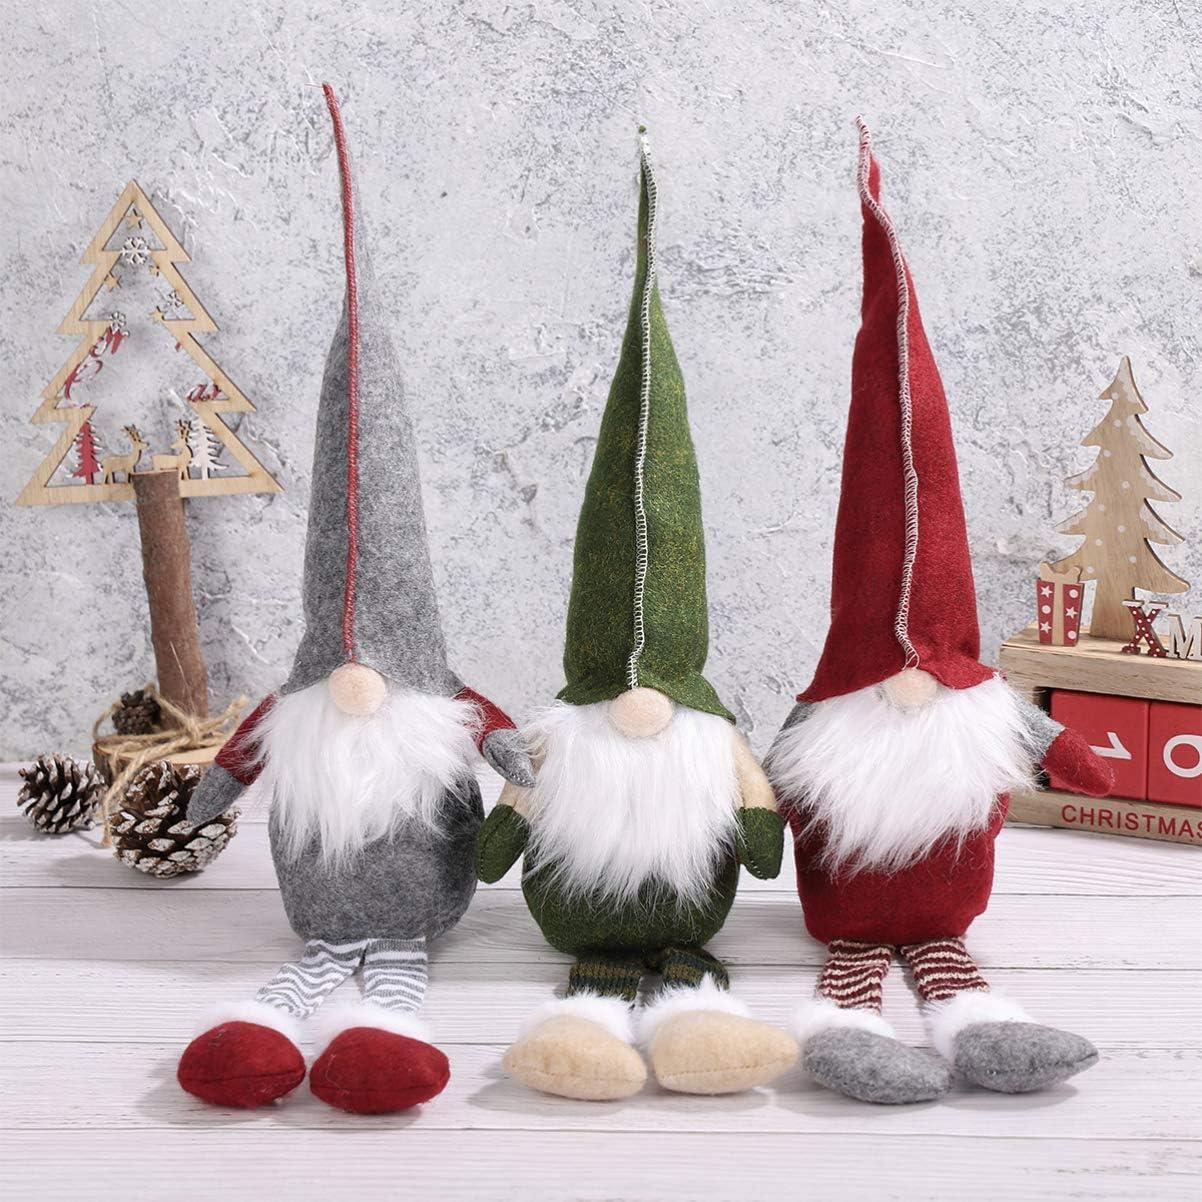 NUOBESTY Santa Gnome Plush 3PCS Xmas Treetop Christmas Decoration Plush Desktop Ornaments for Christmas Santa Decoration Table Decor Red, Green, Gray